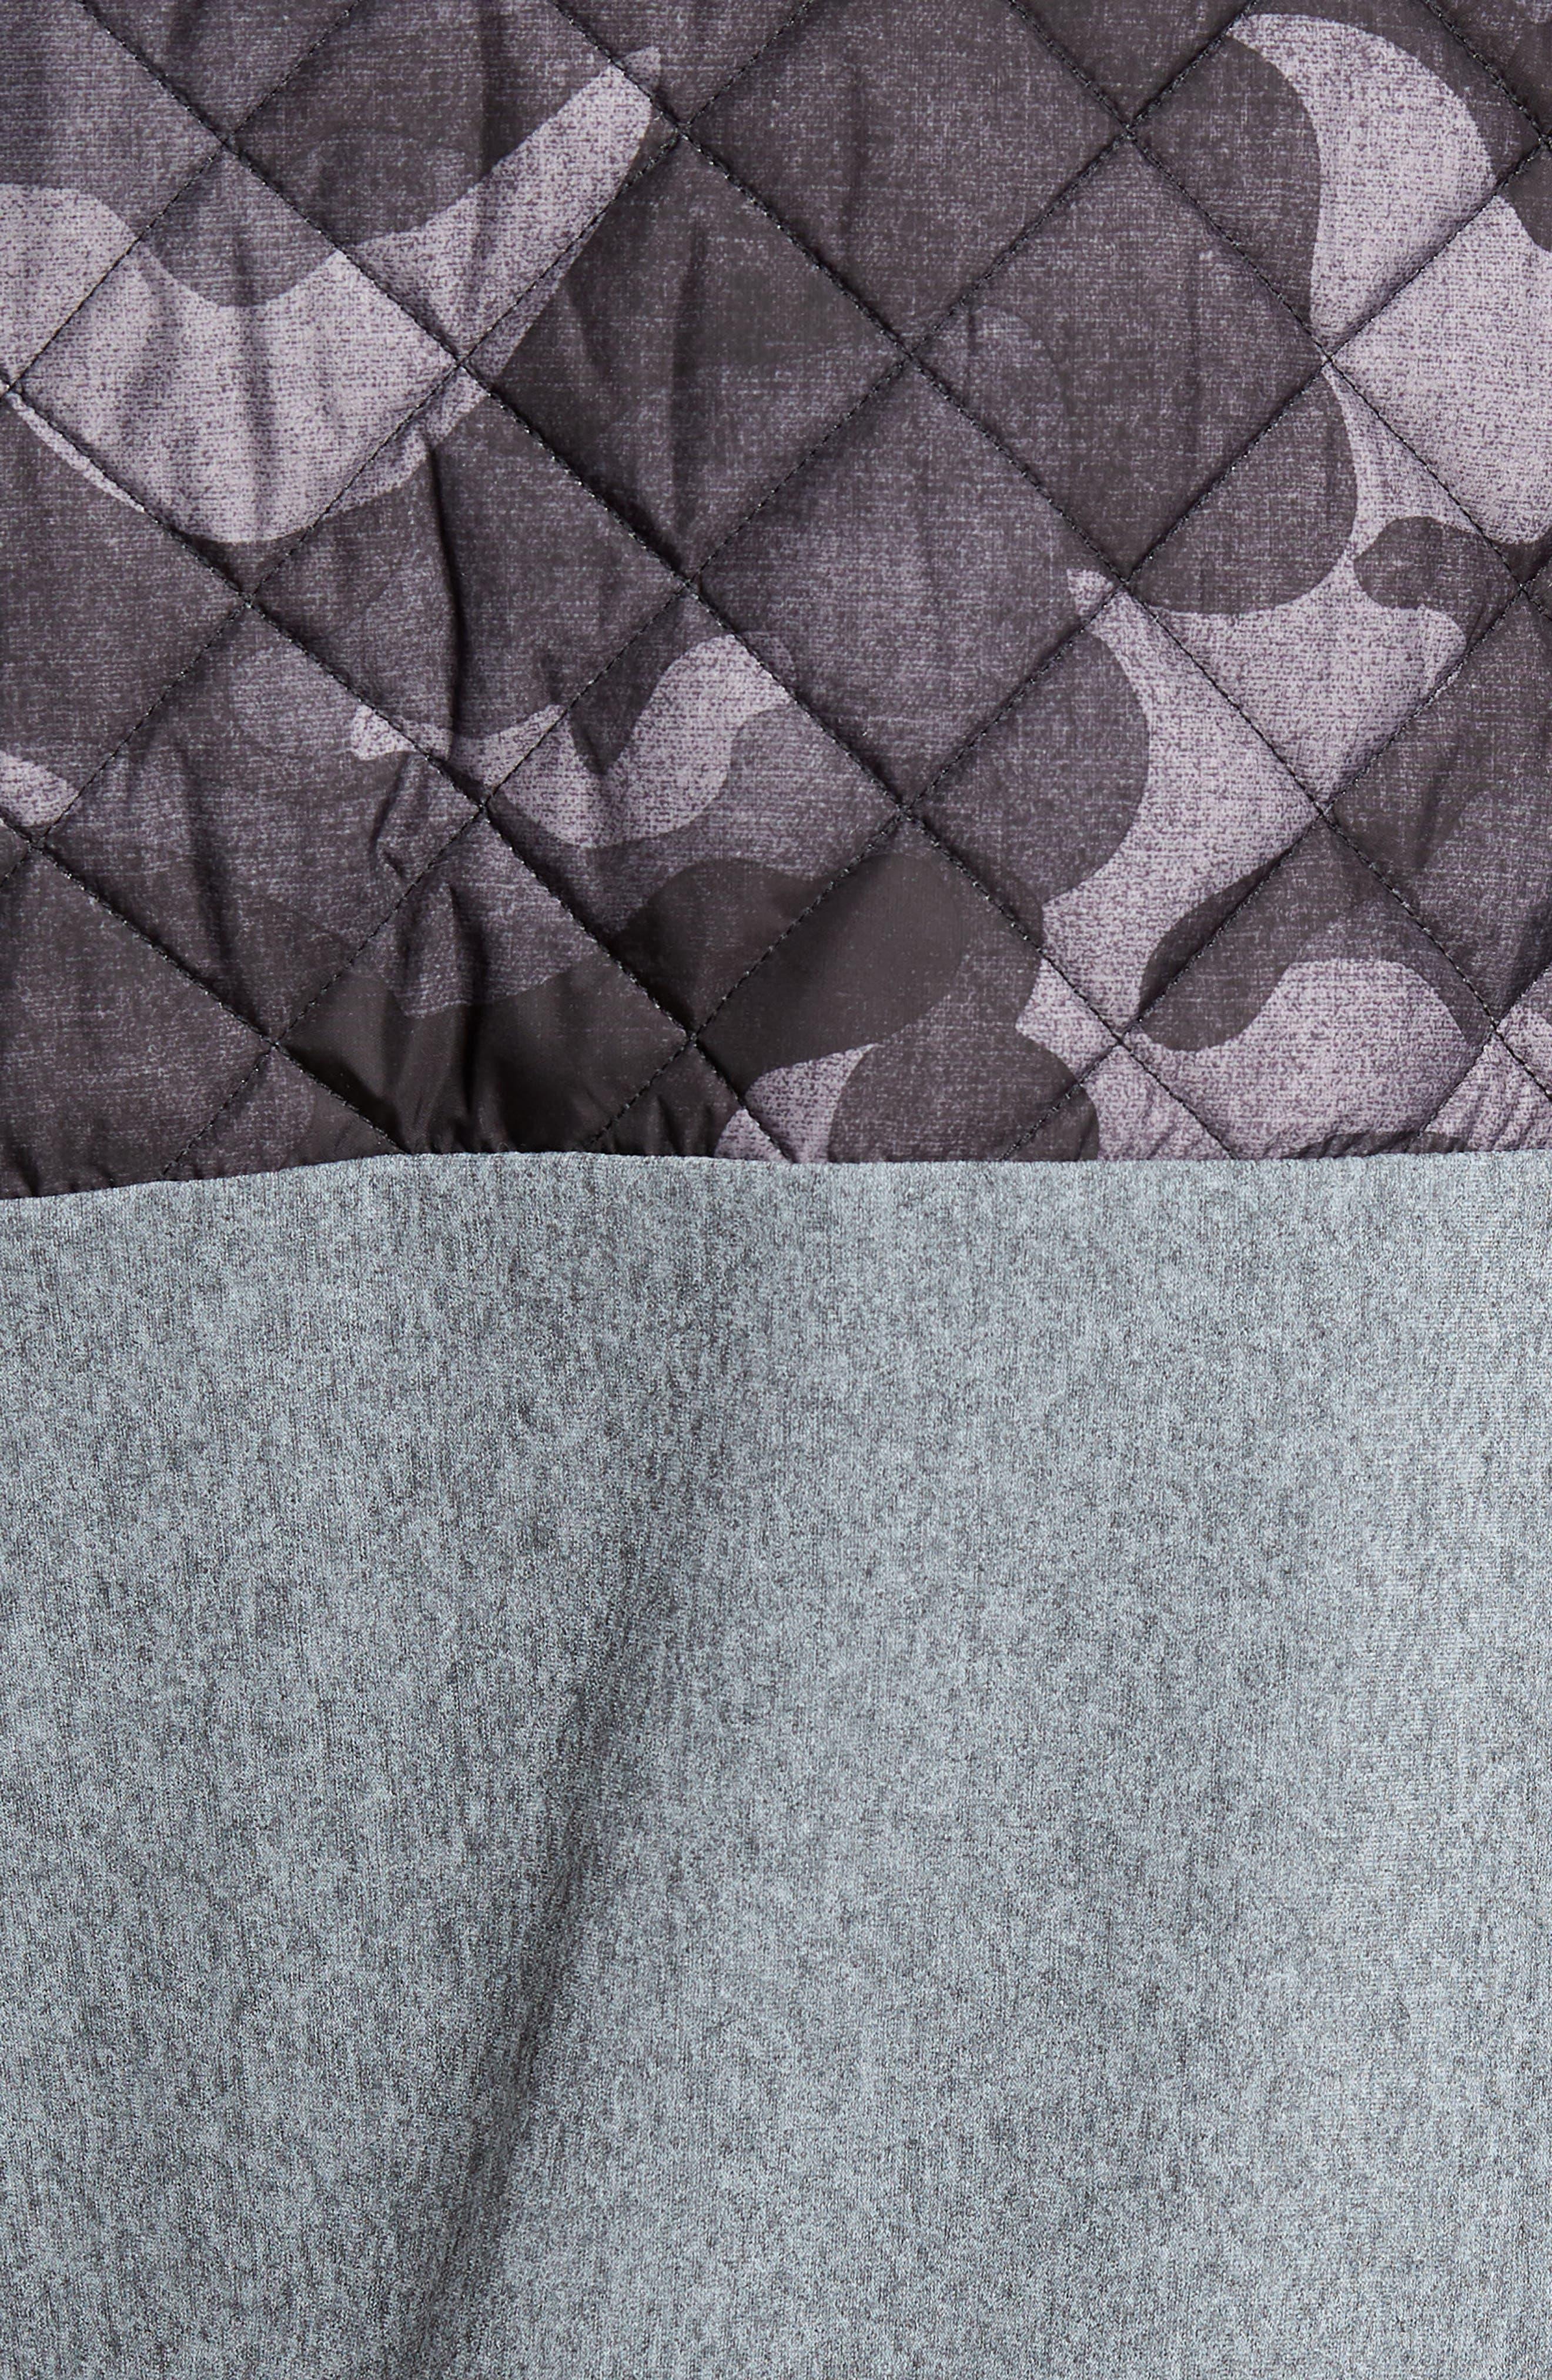 Huron Hybrid Vest,                             Alternate thumbnail 7, color,                             GREY HEATHER/ GREY CAMO